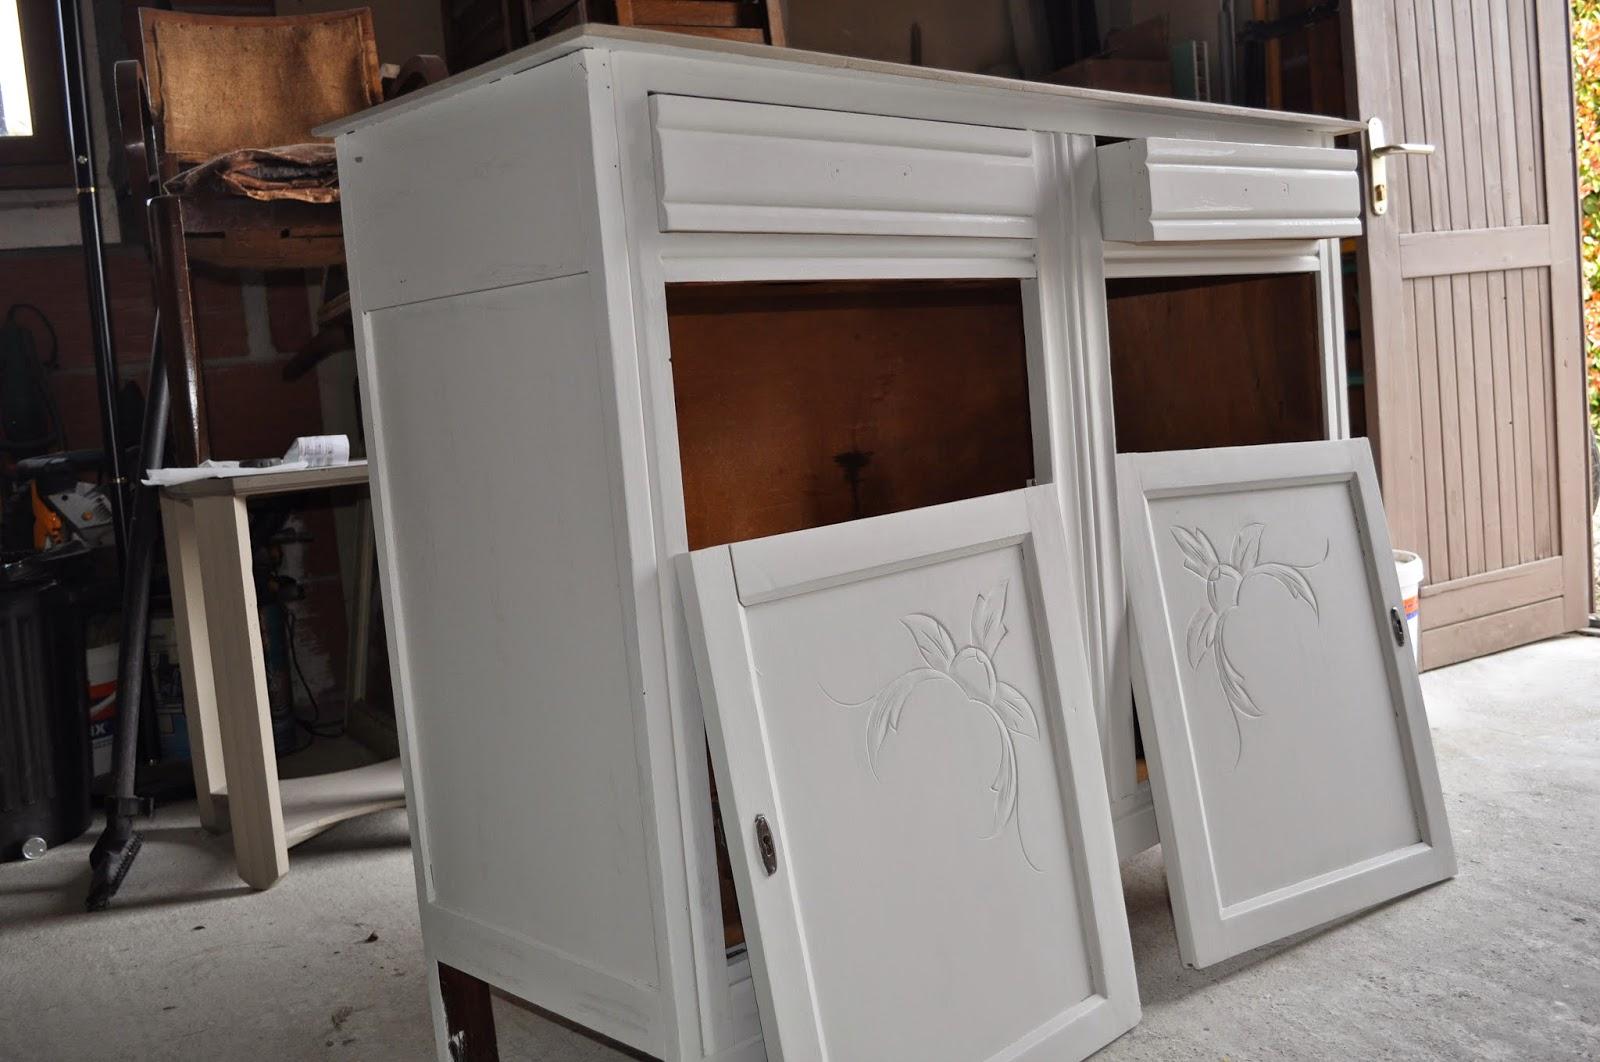 bois et patines nathalie madrenes buffet patine shabby chic. Black Bedroom Furniture Sets. Home Design Ideas